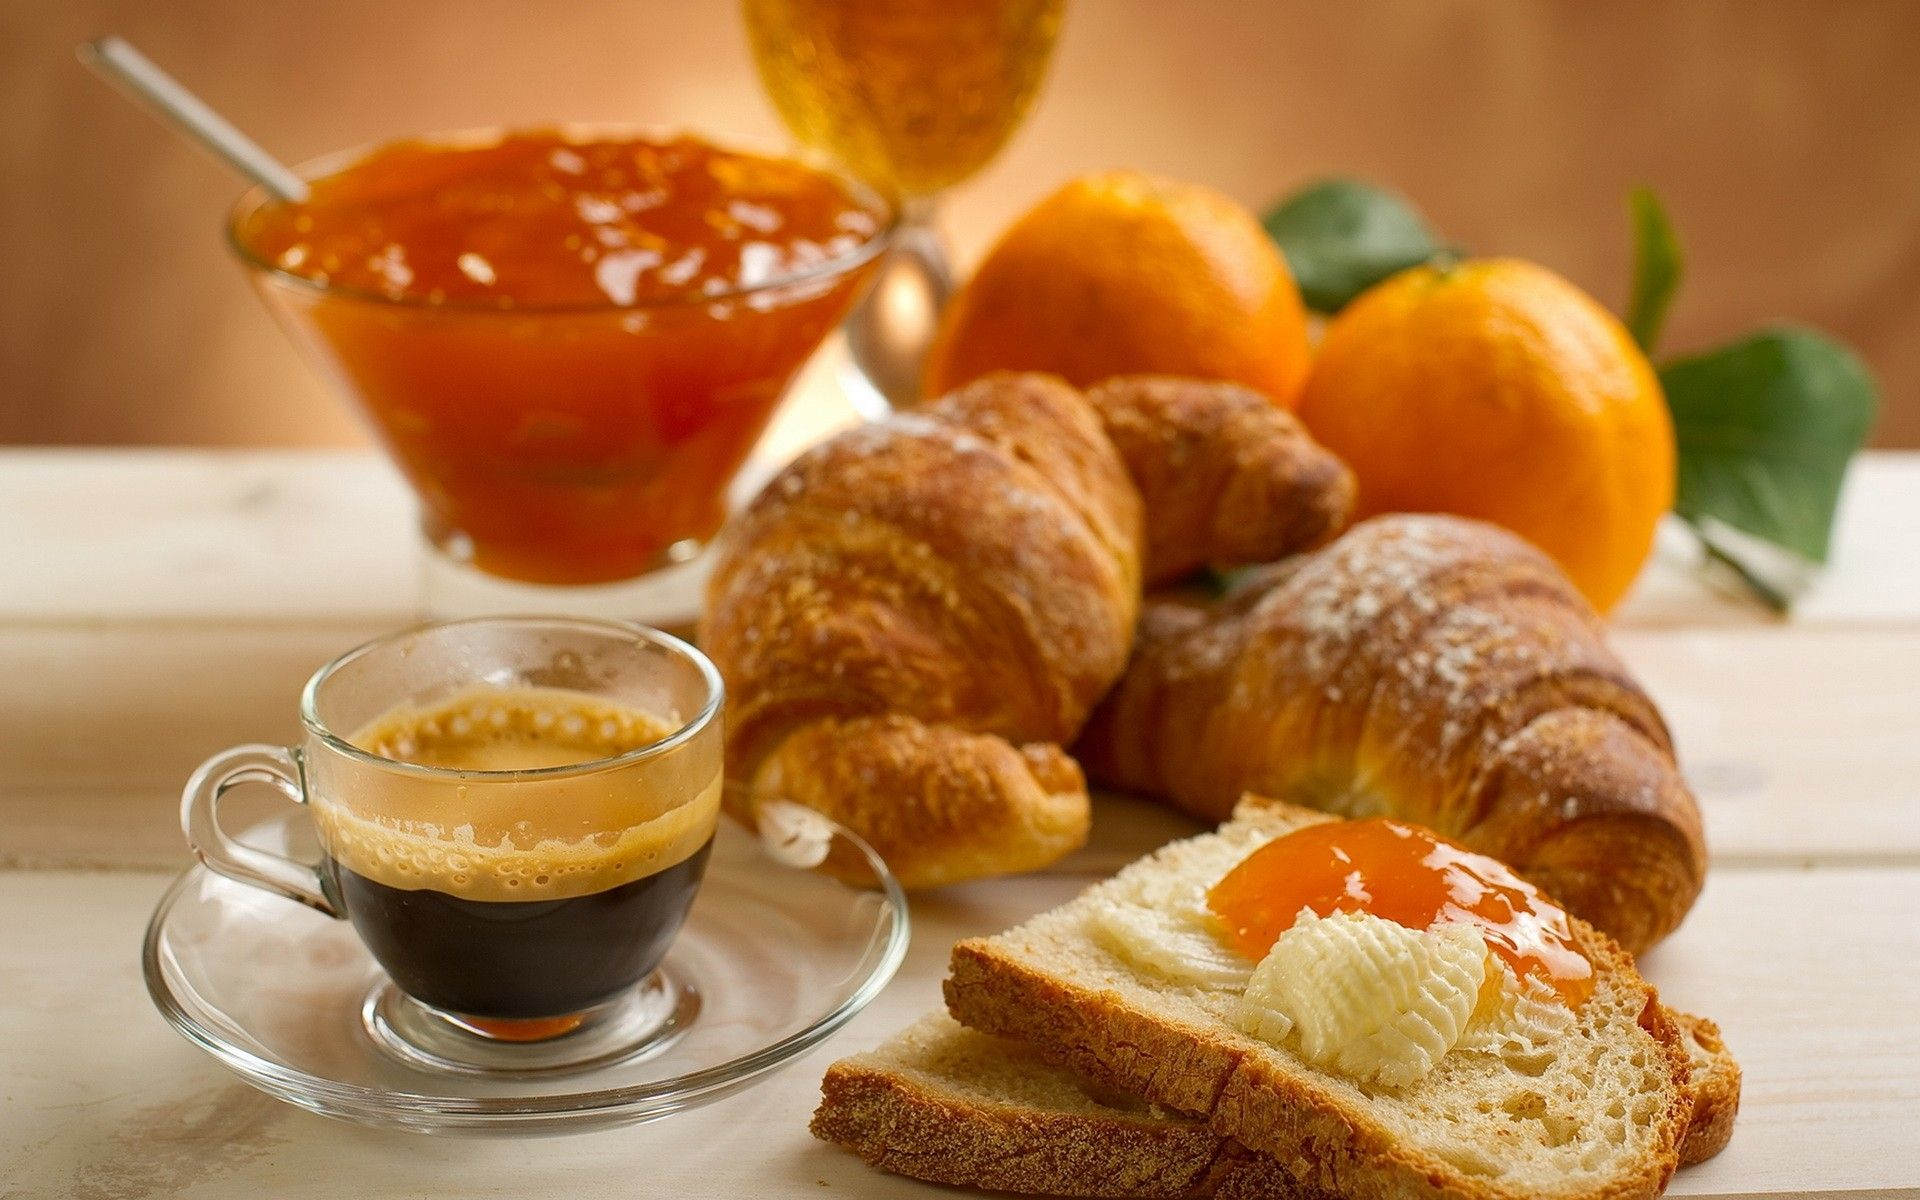 Lundi 9 novembre Petit-dejeuner-maladies-chroniques-emploi1